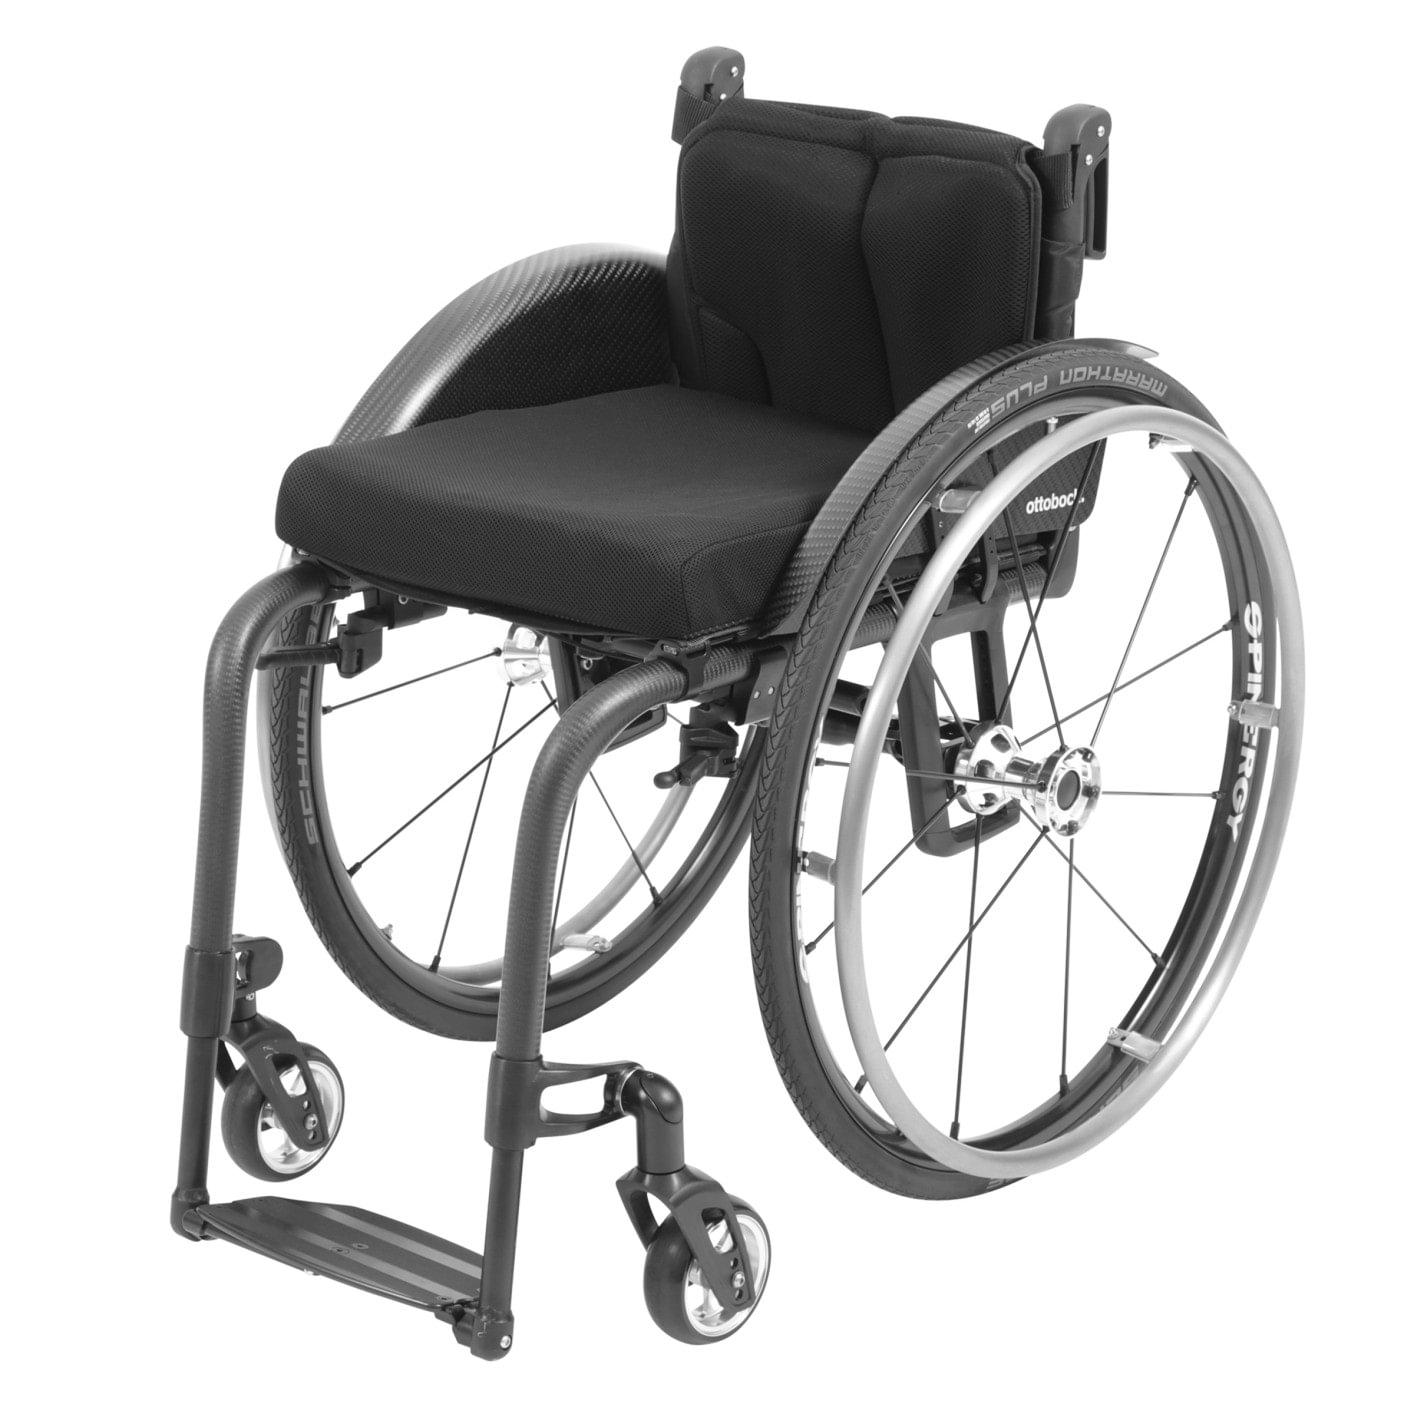 zenit fauteuil roulant manuel ottobock france. Black Bedroom Furniture Sets. Home Design Ideas